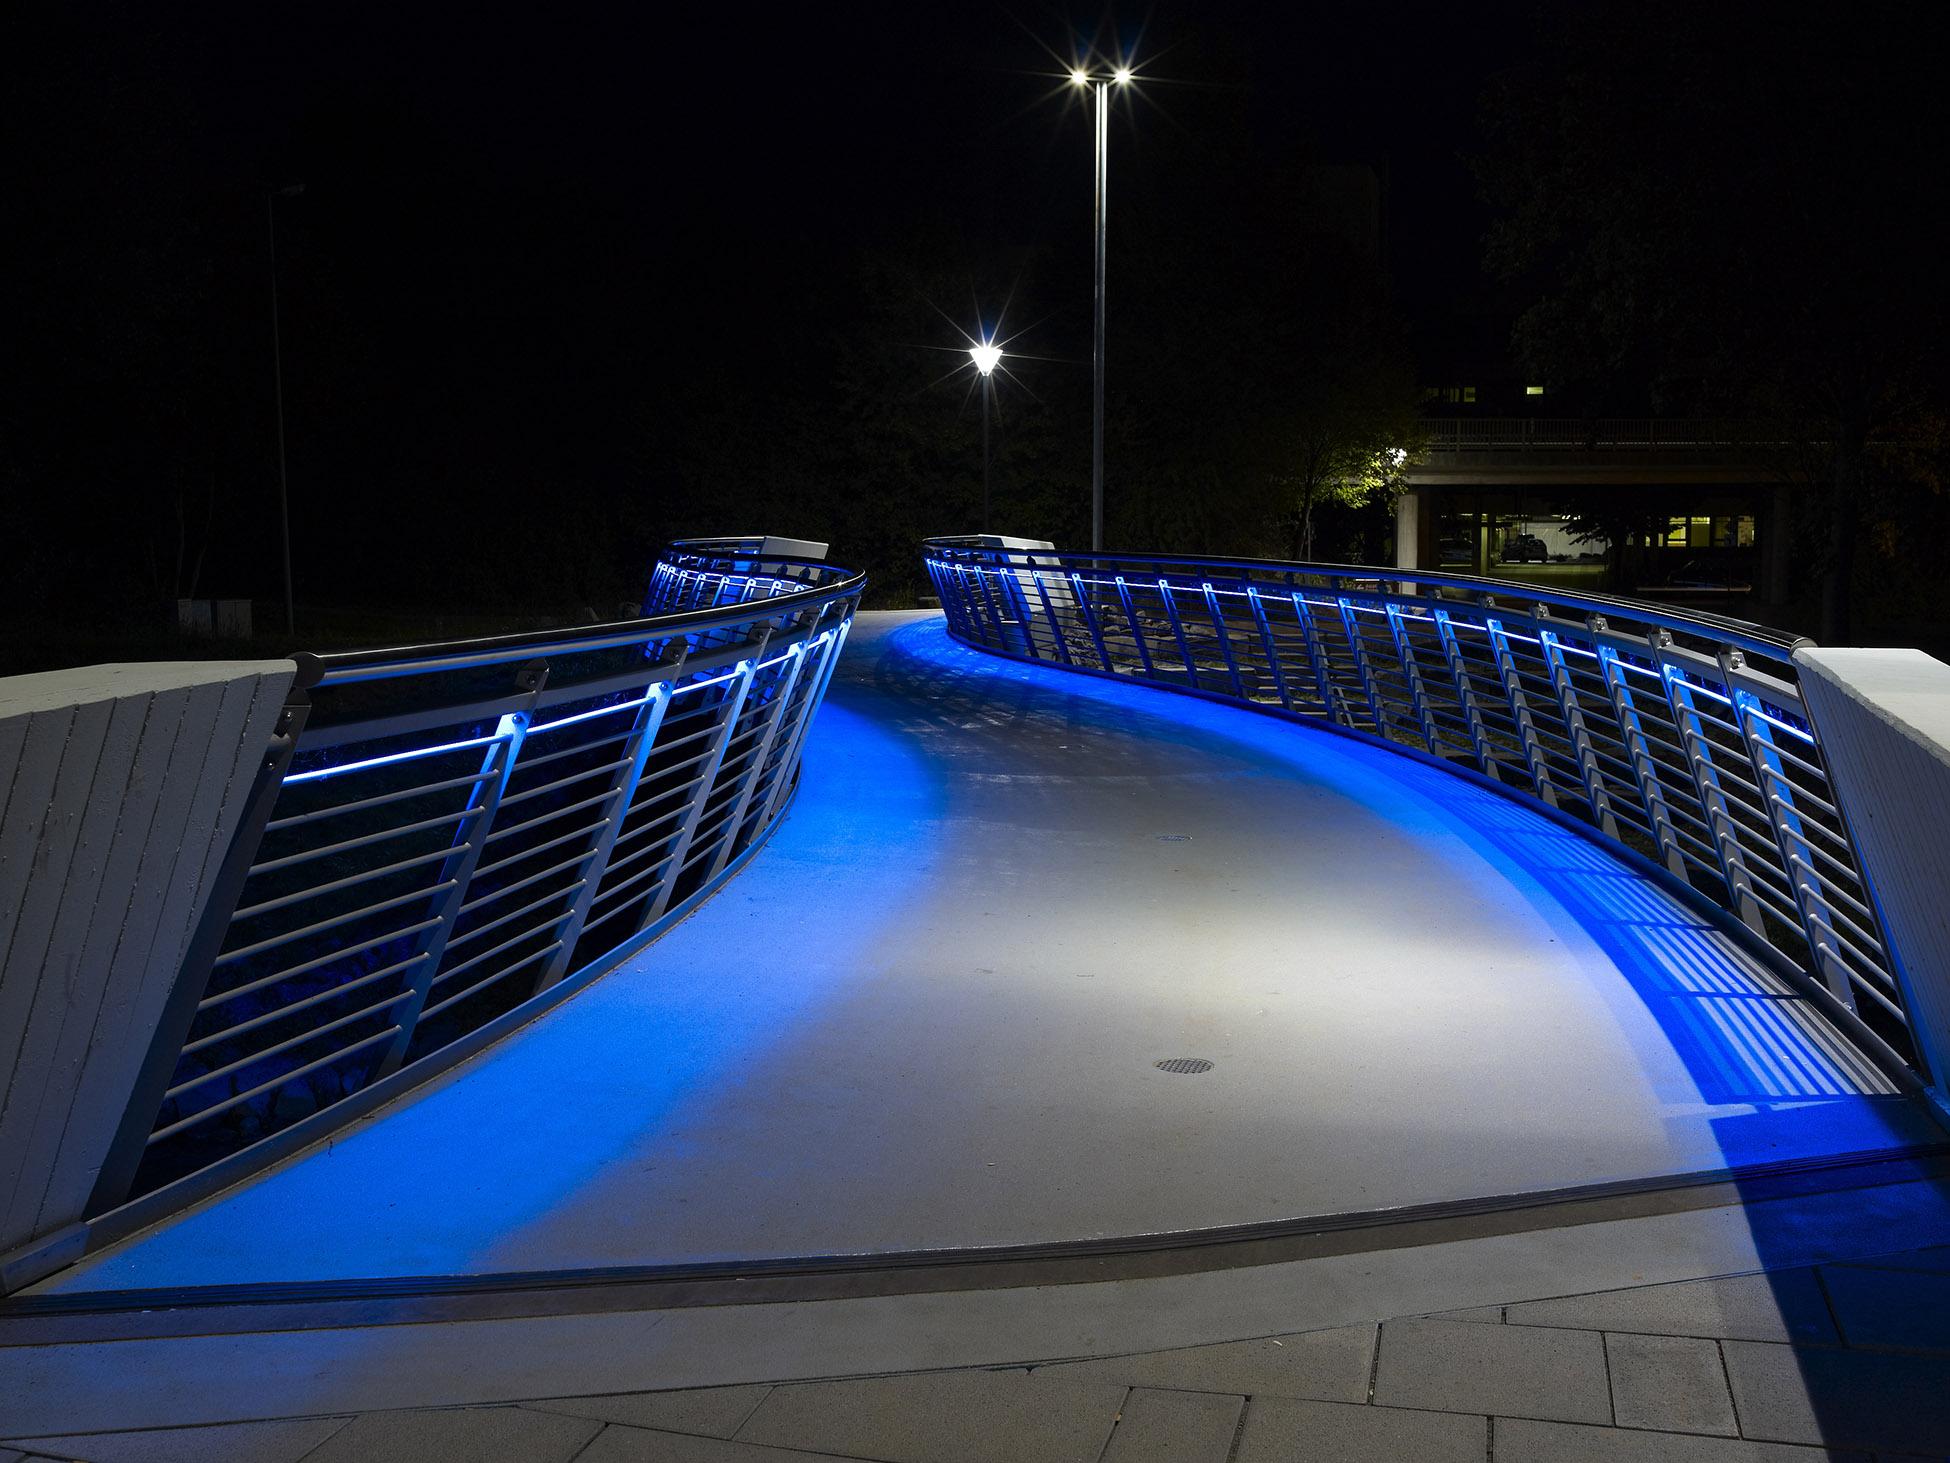 Brücke bei Nacht mit blauer LED Beleuchtung